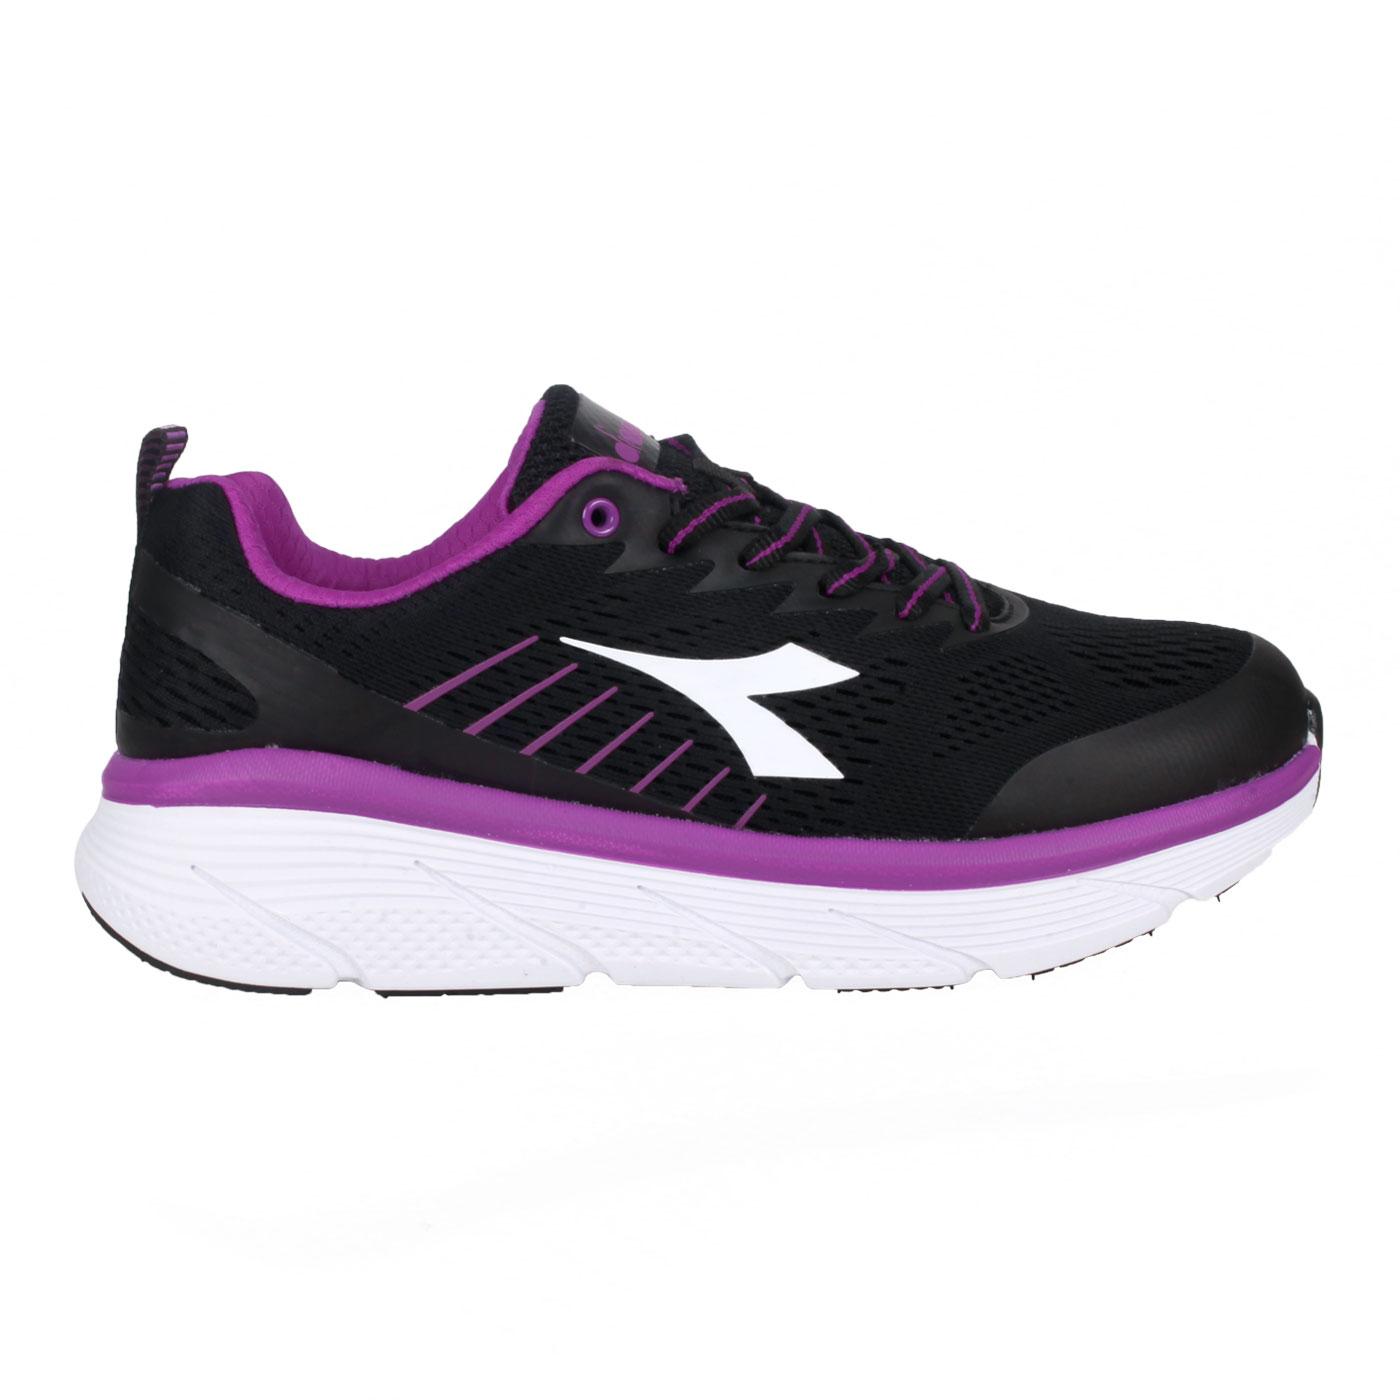 DIADORA 女款專業避震慢跑鞋 DA31636 - 黑紫